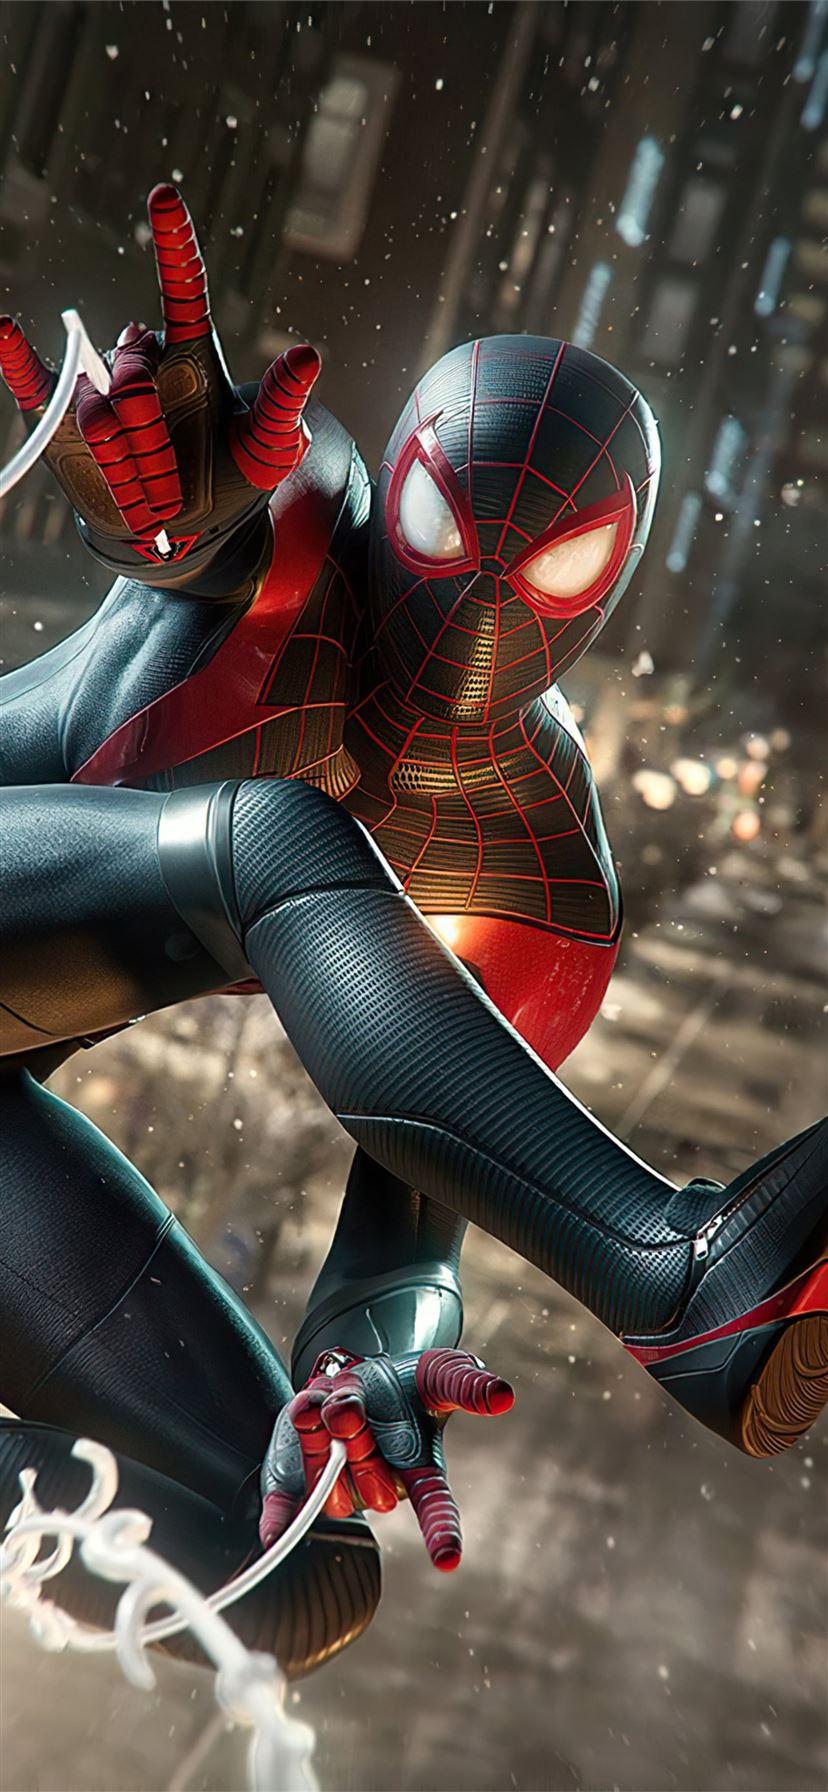 Marvels Spiderman Miles Morales 4k 2020 Iphone 11 Wallpapers Free Download Spider man miles morales logo 4k iphone x wallpaper. marvels spiderman miles morales 4k 2020